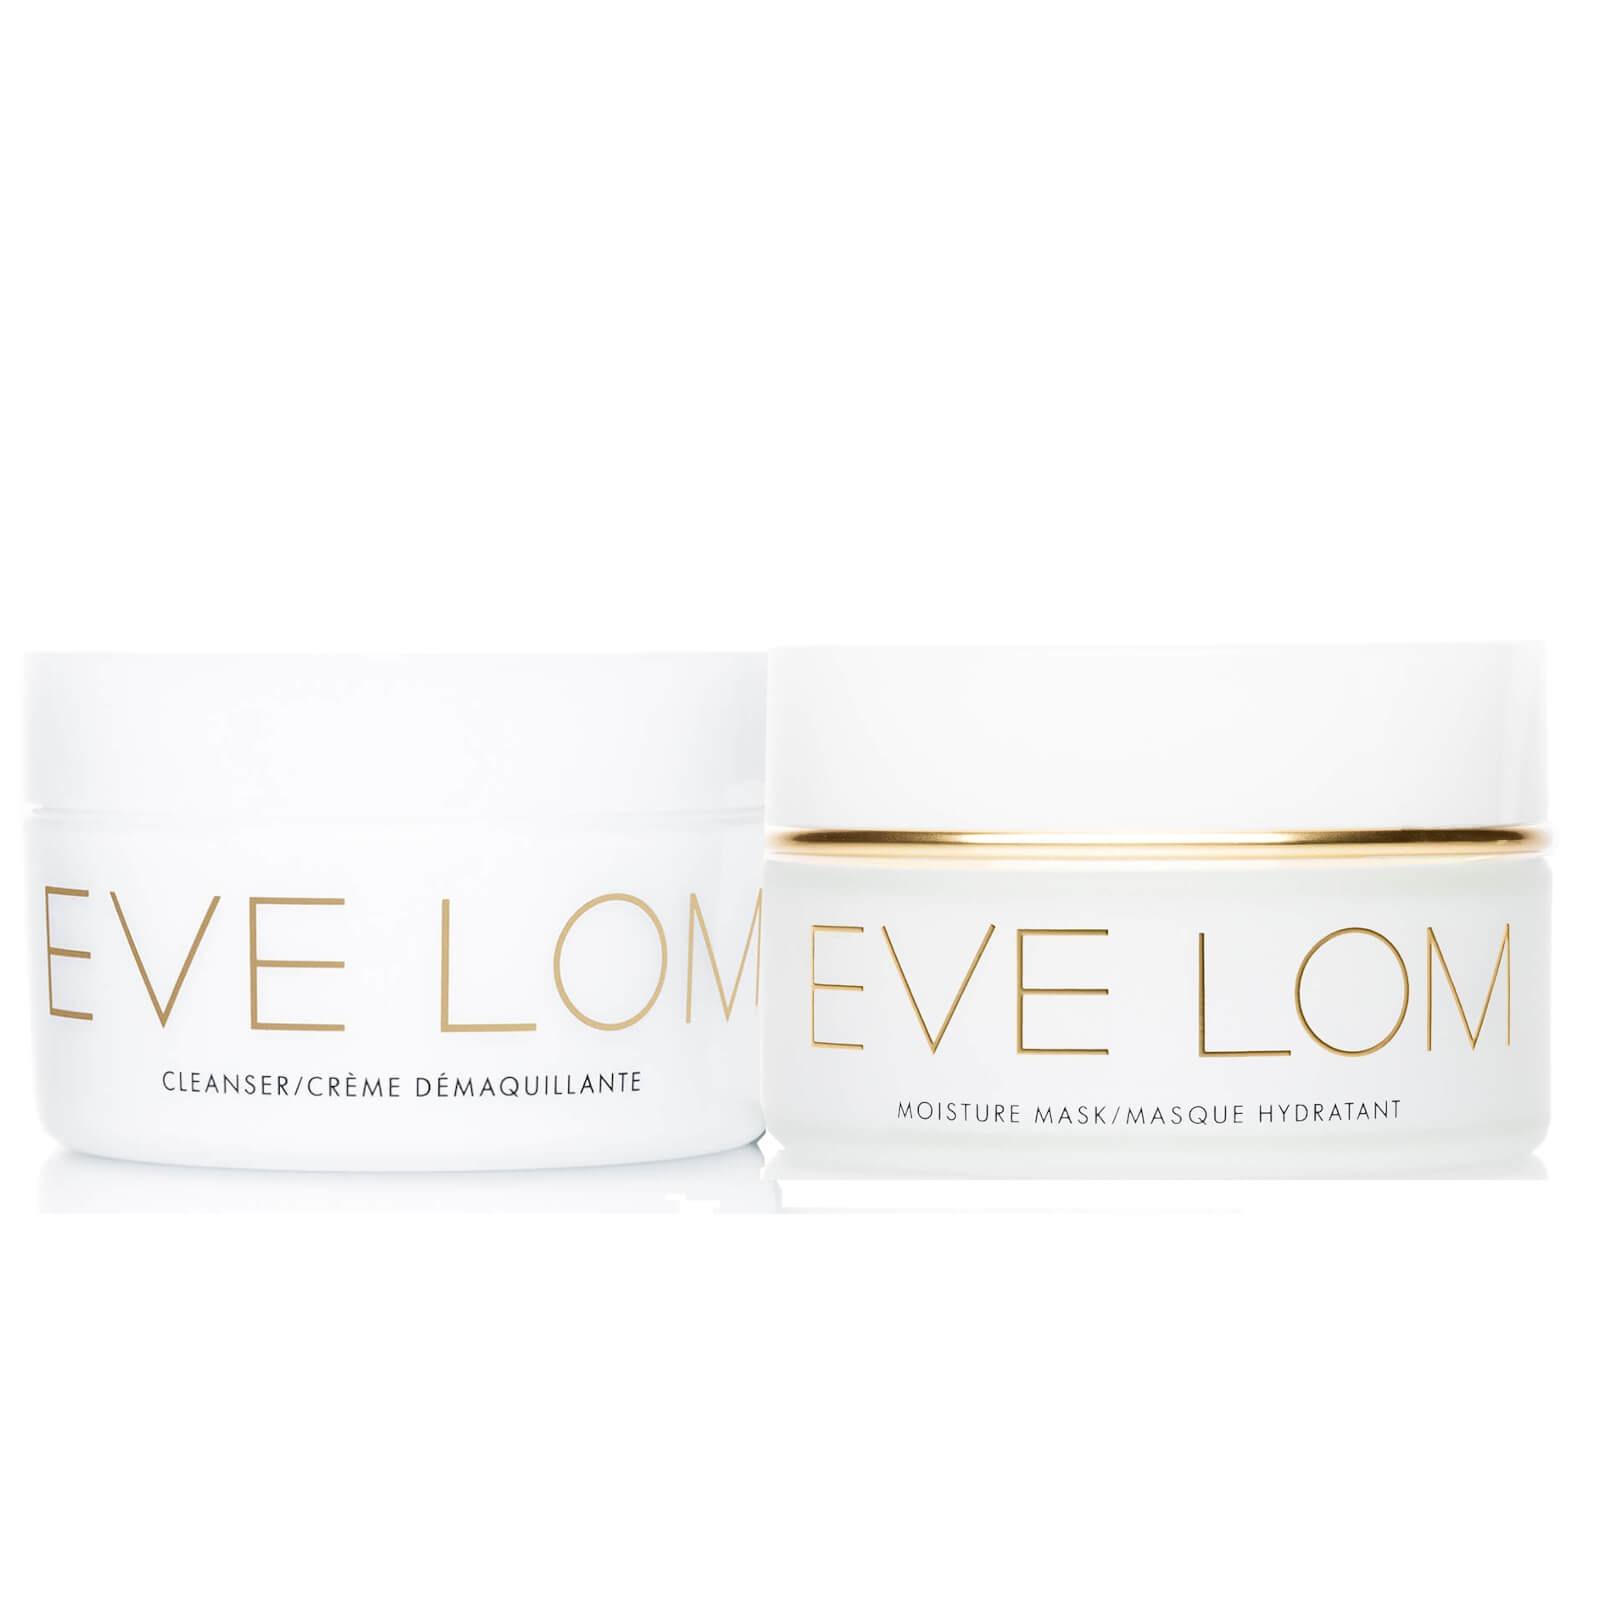 EVE LOM 卸妆膏+面膜组合套装